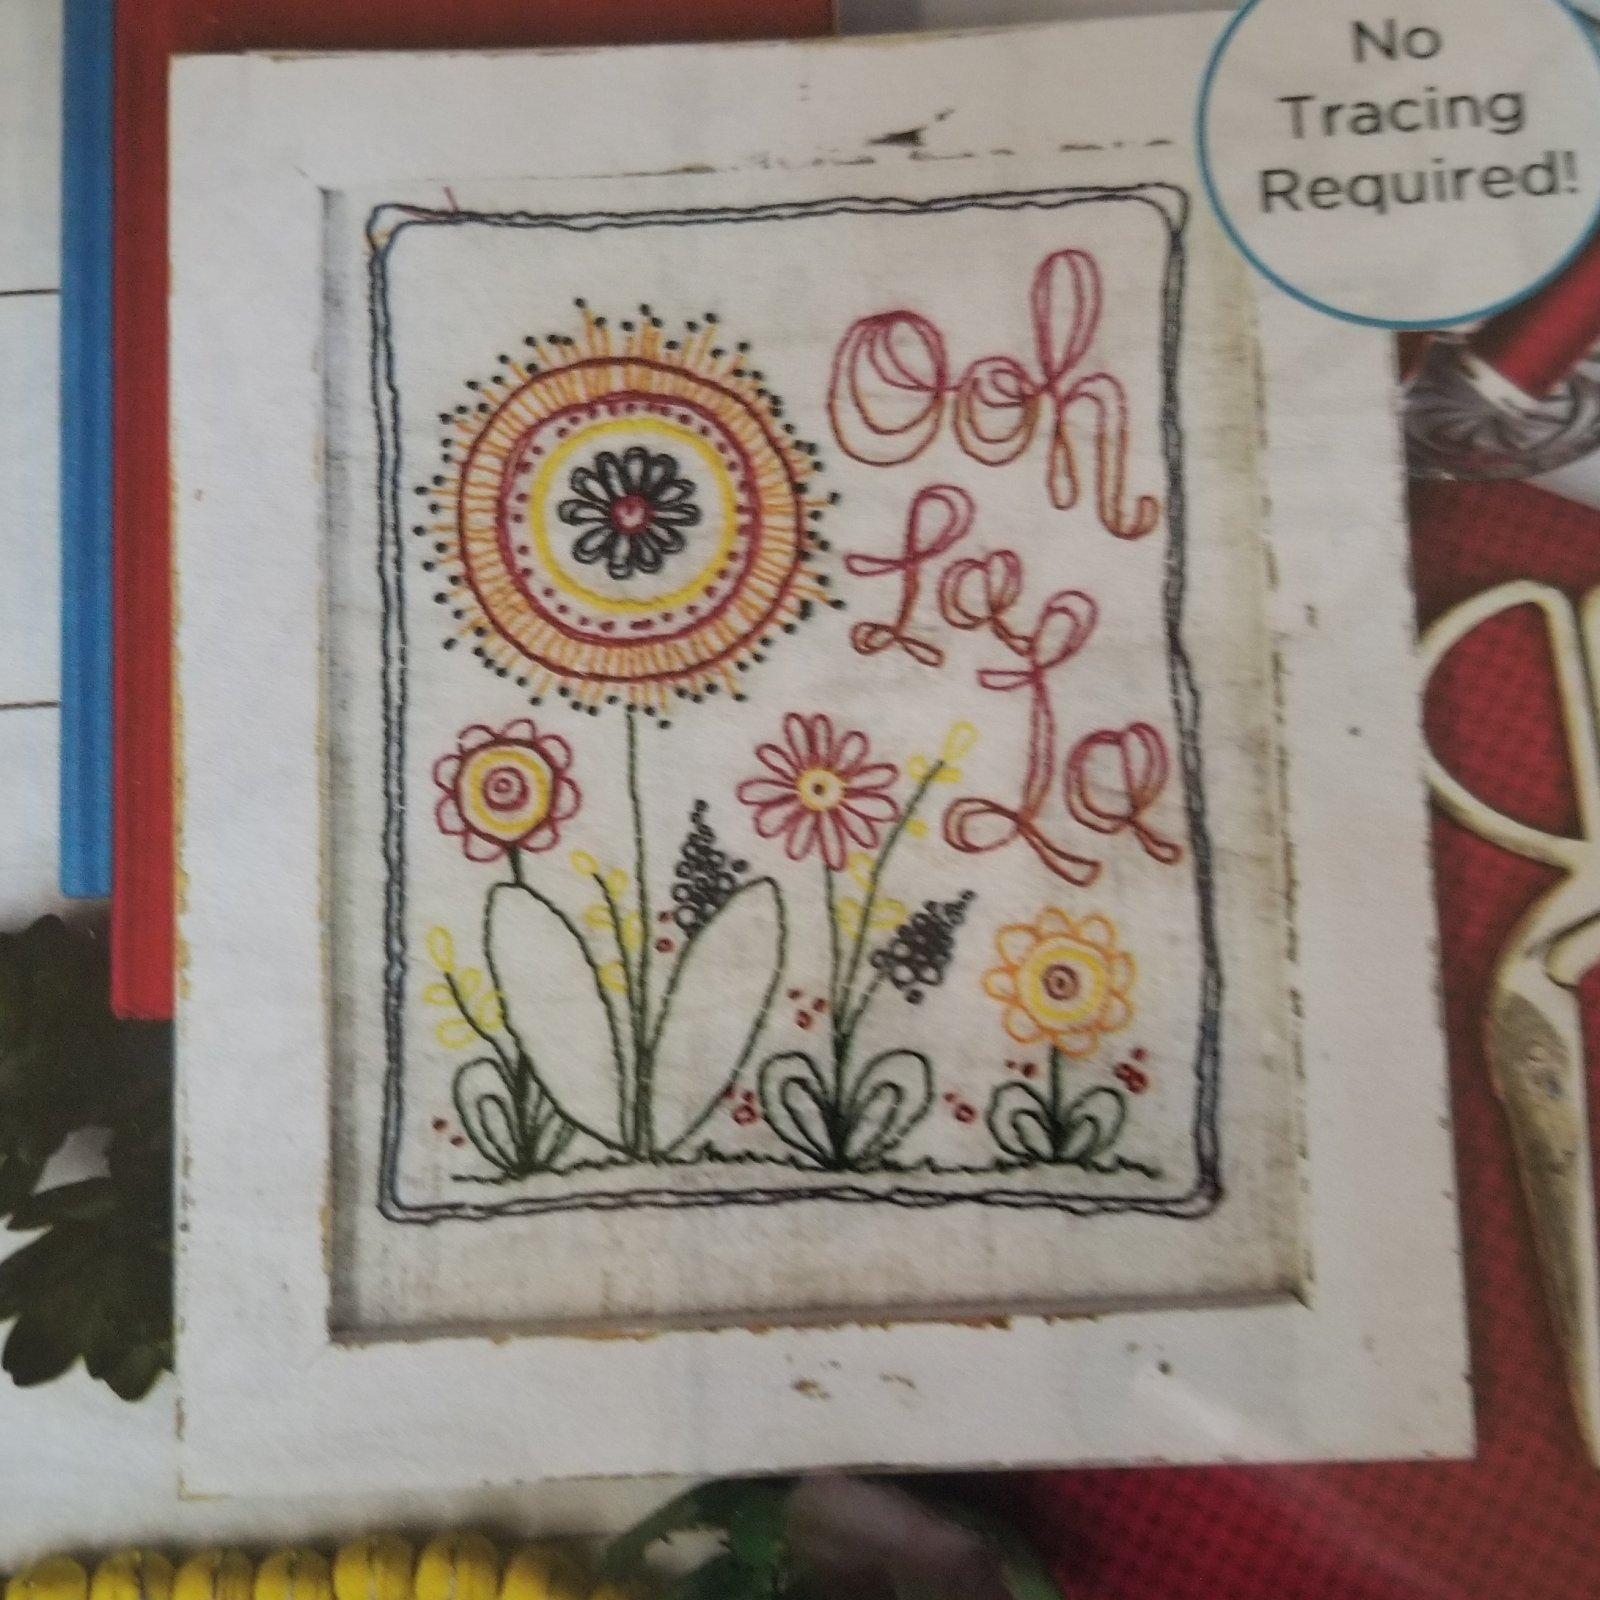 ADORNit Flower Garden Ooh La La